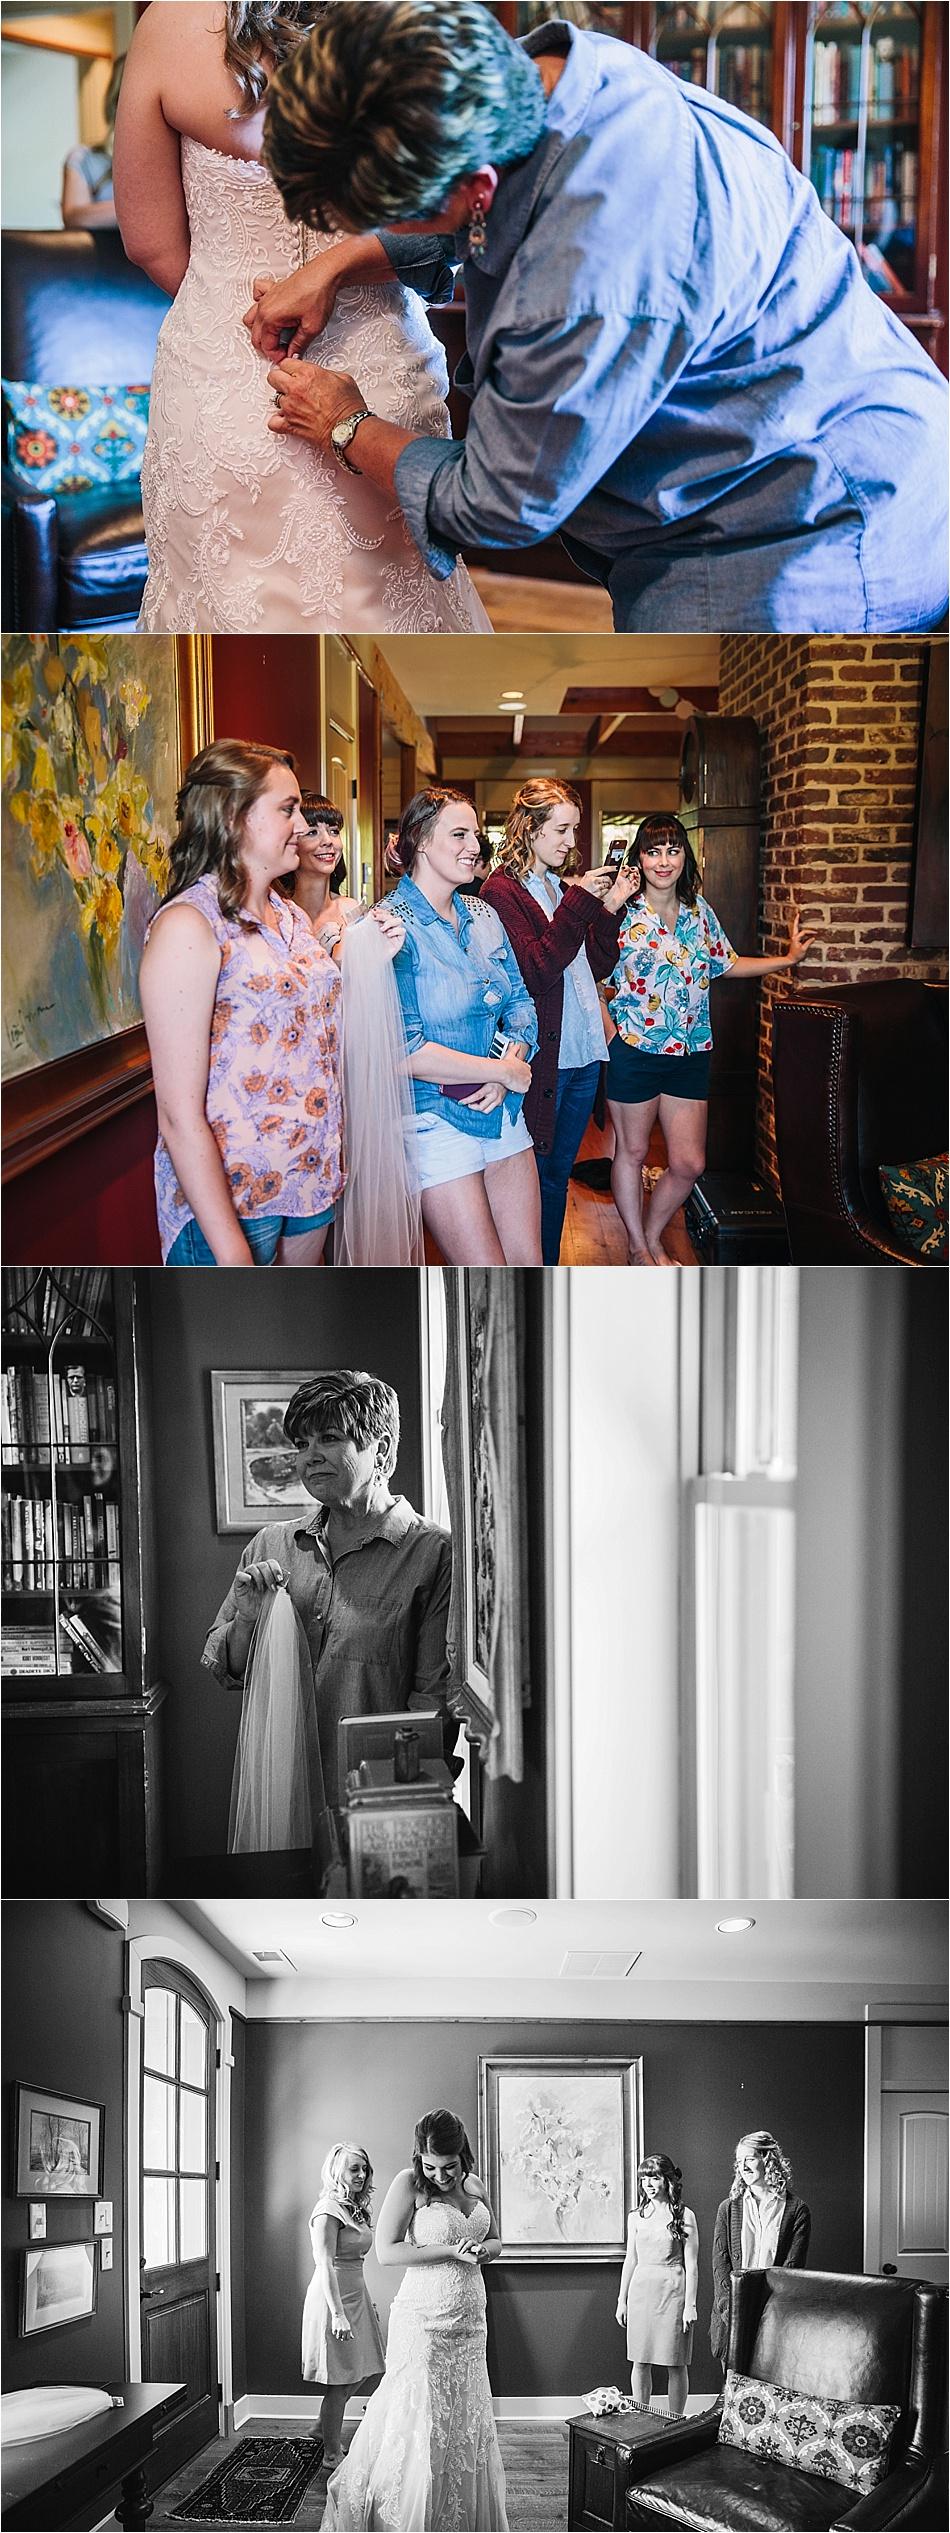 CK-Photo-Nashville-Wedding-Photographer-_0006.jpg